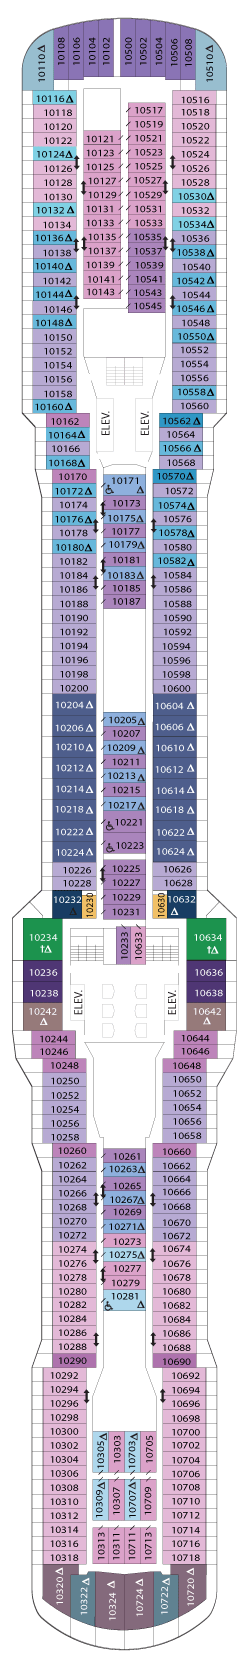 Ovation of the Seas Deck 10